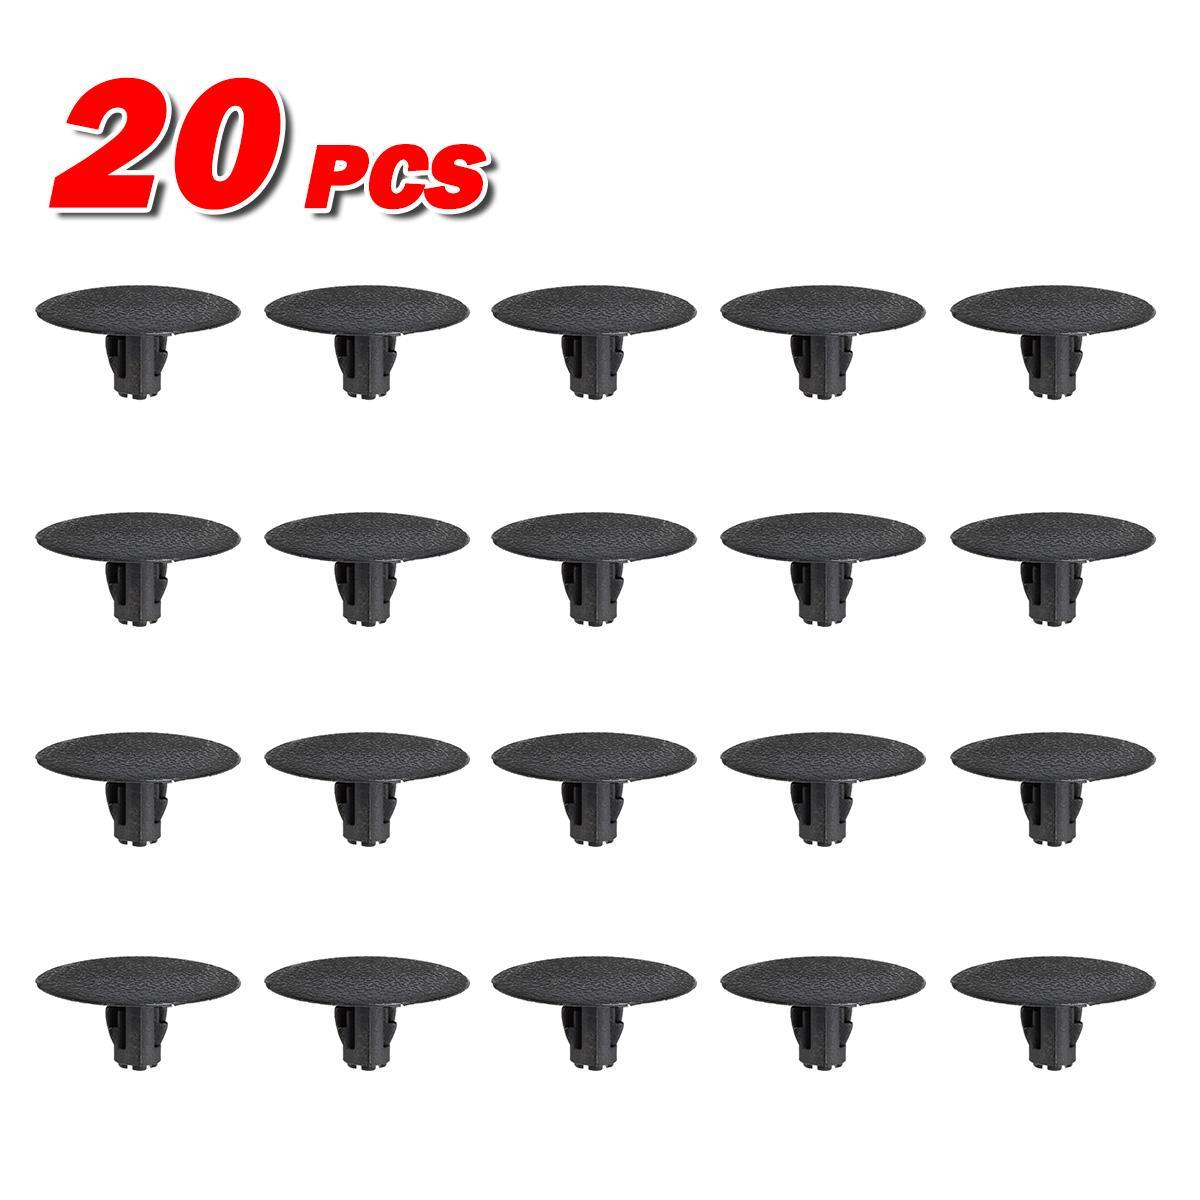 20pcs Headliner Clips Retainer Fastener for # Mini-Cooper 51-43-7-001-491-2